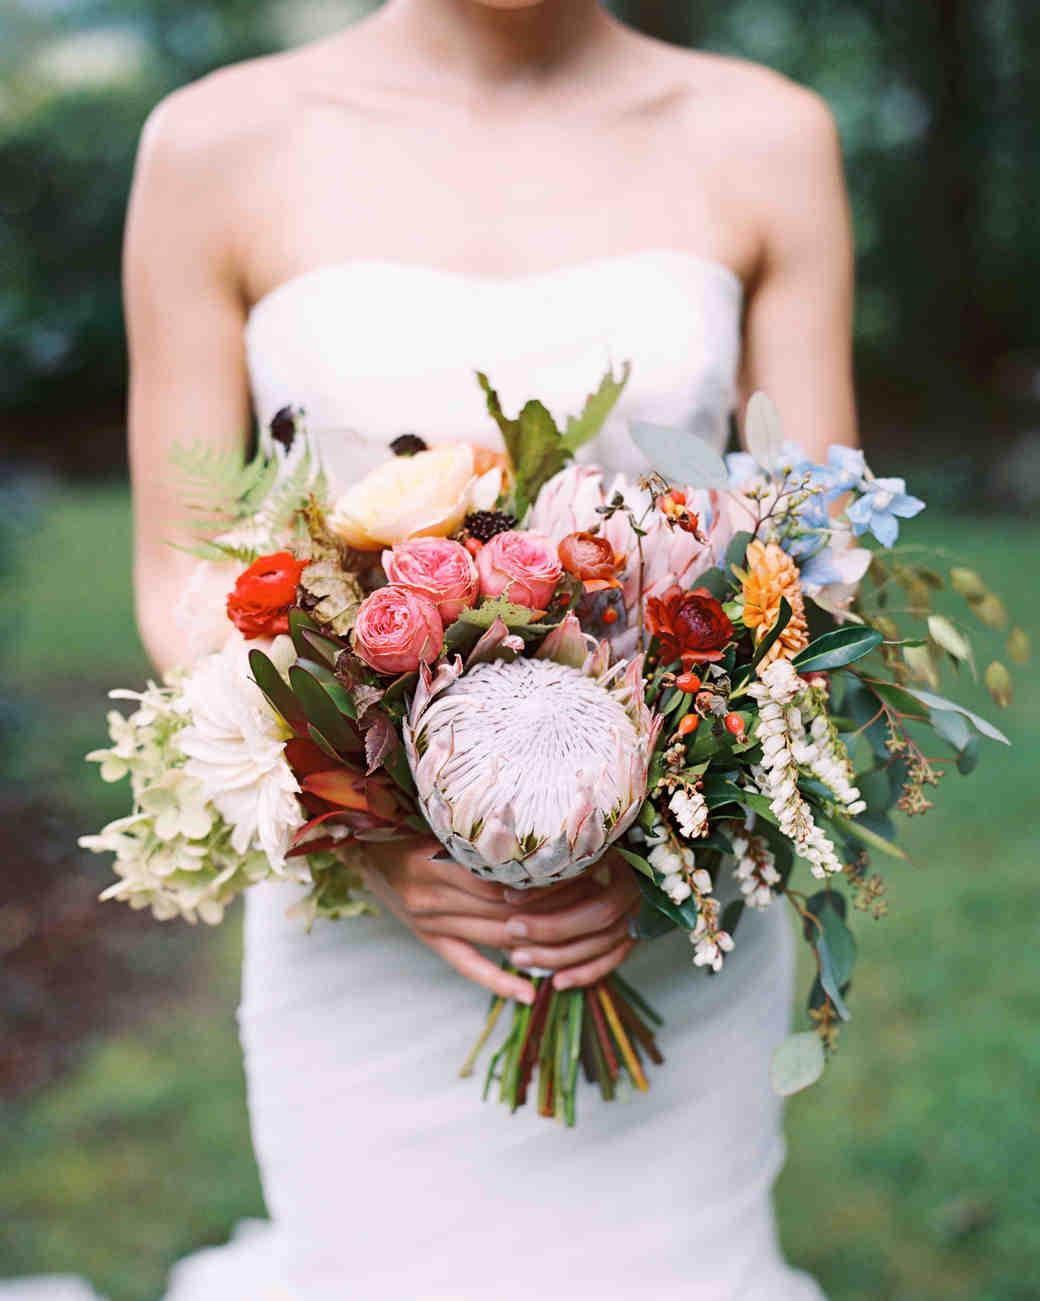 50 great wedding bouquets wedding bouquet Protea Wedding Bouquet